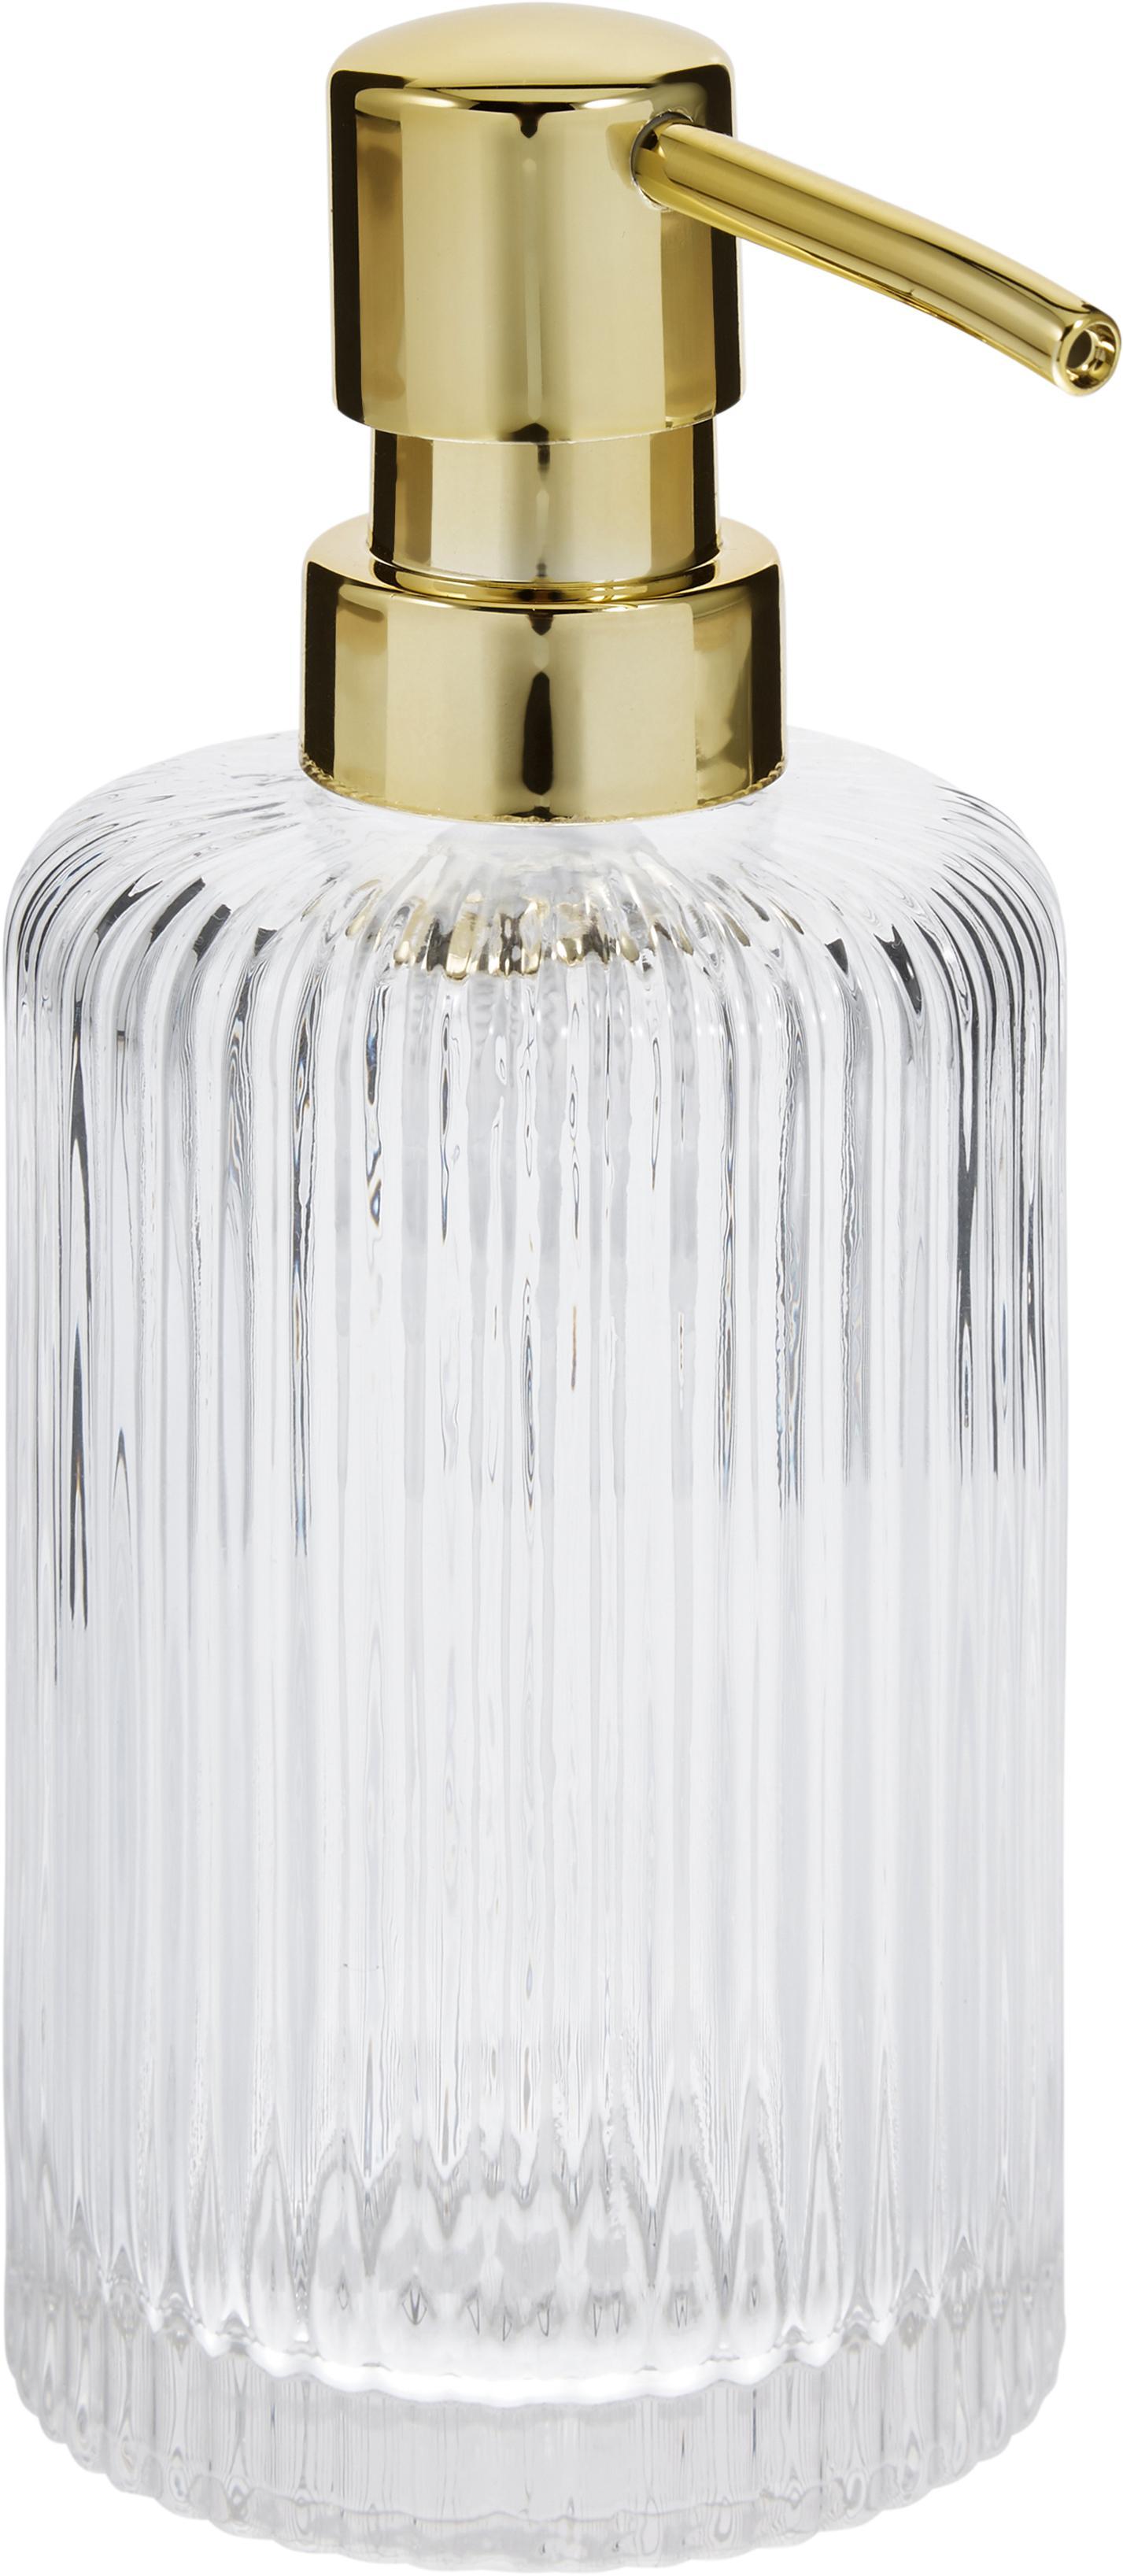 Zeepdispenser Gulji van glas, Houder: glas, Pompje: kunststof, Transparant, goudkleurig, Ø 7 x H 17 cm